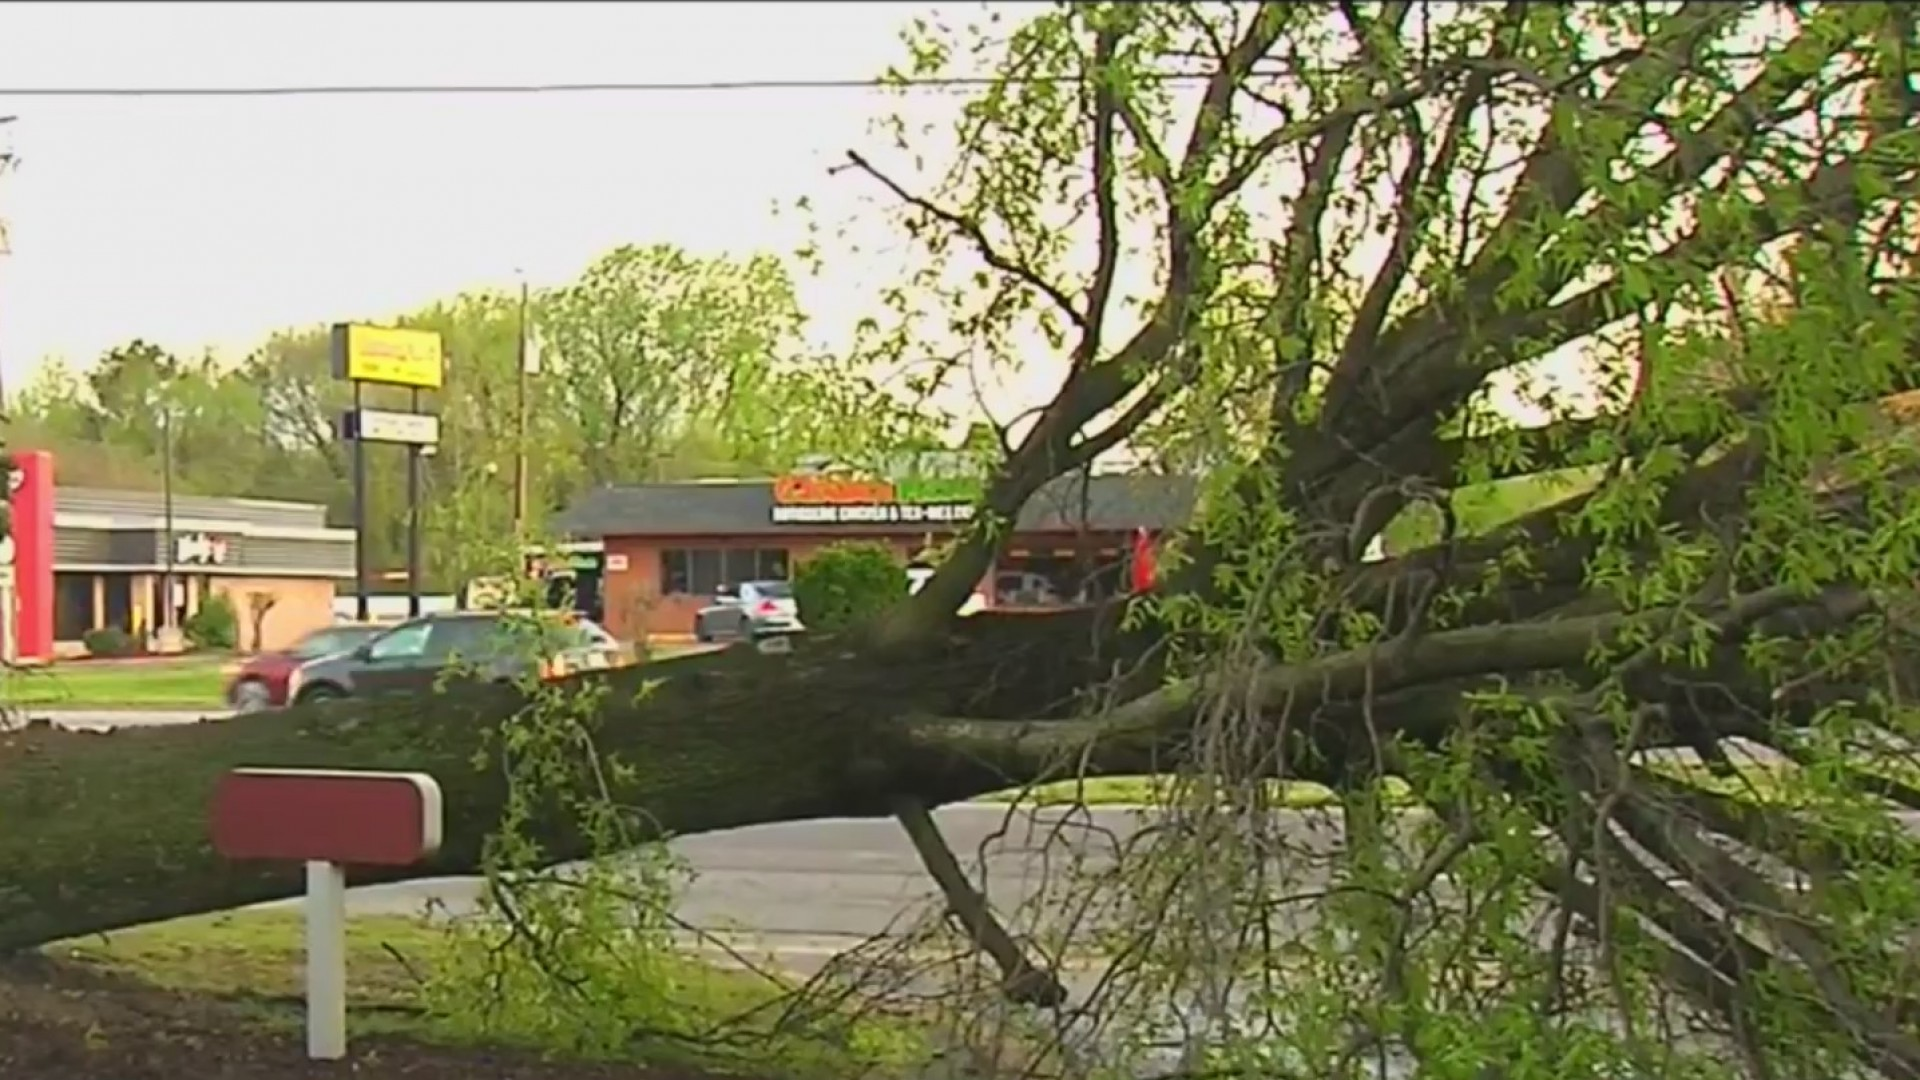 Severe_storms_bring_down_trees__power_li_0_20190415105414